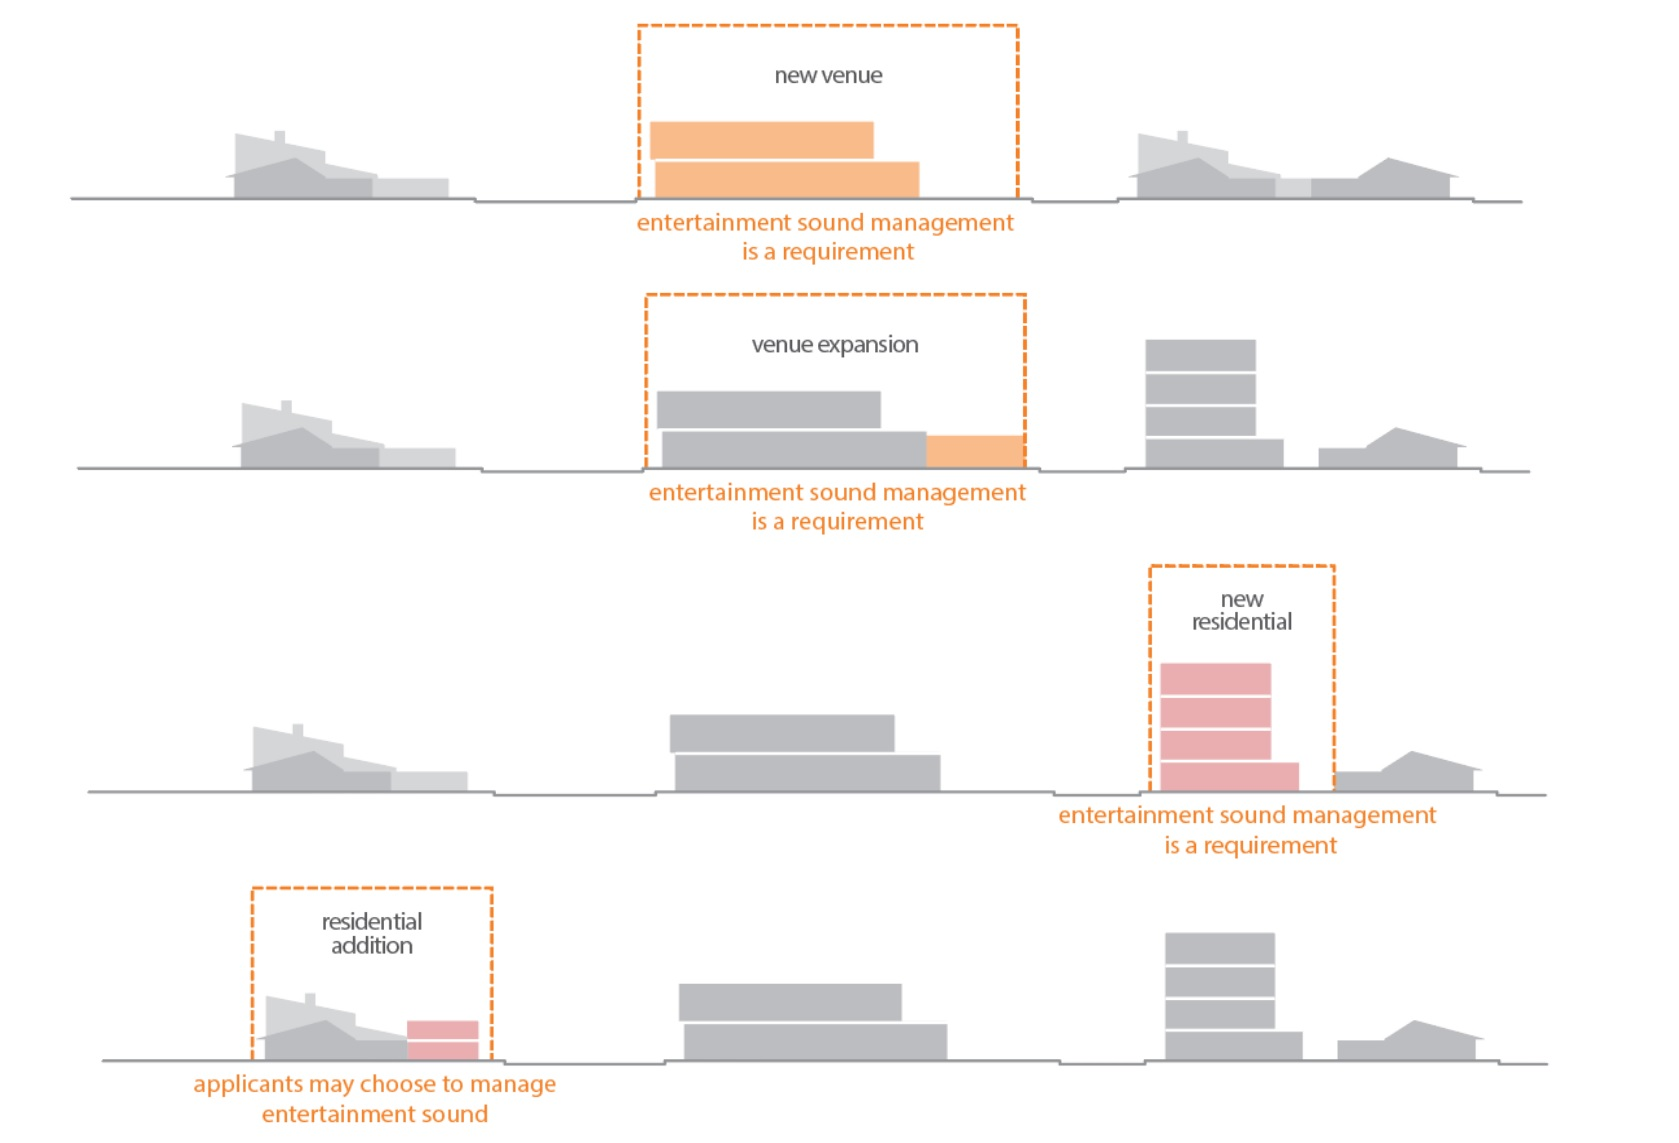 A graph of the entertainment sound management proposal